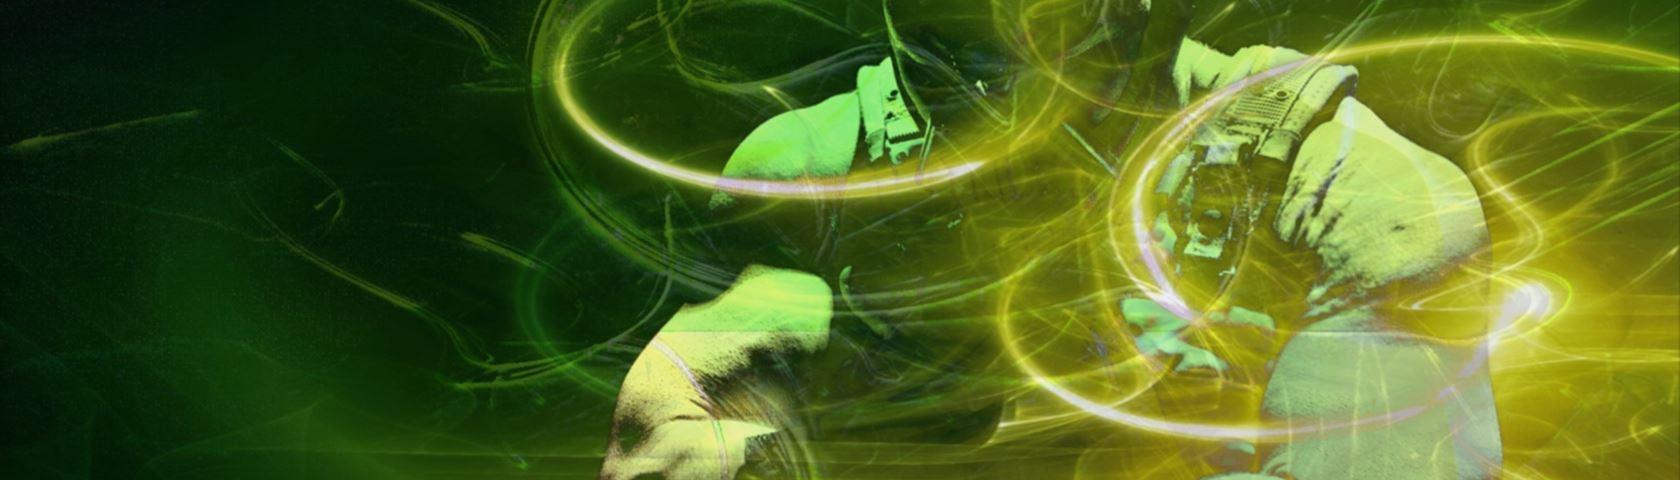 GREEN BANE SERIES